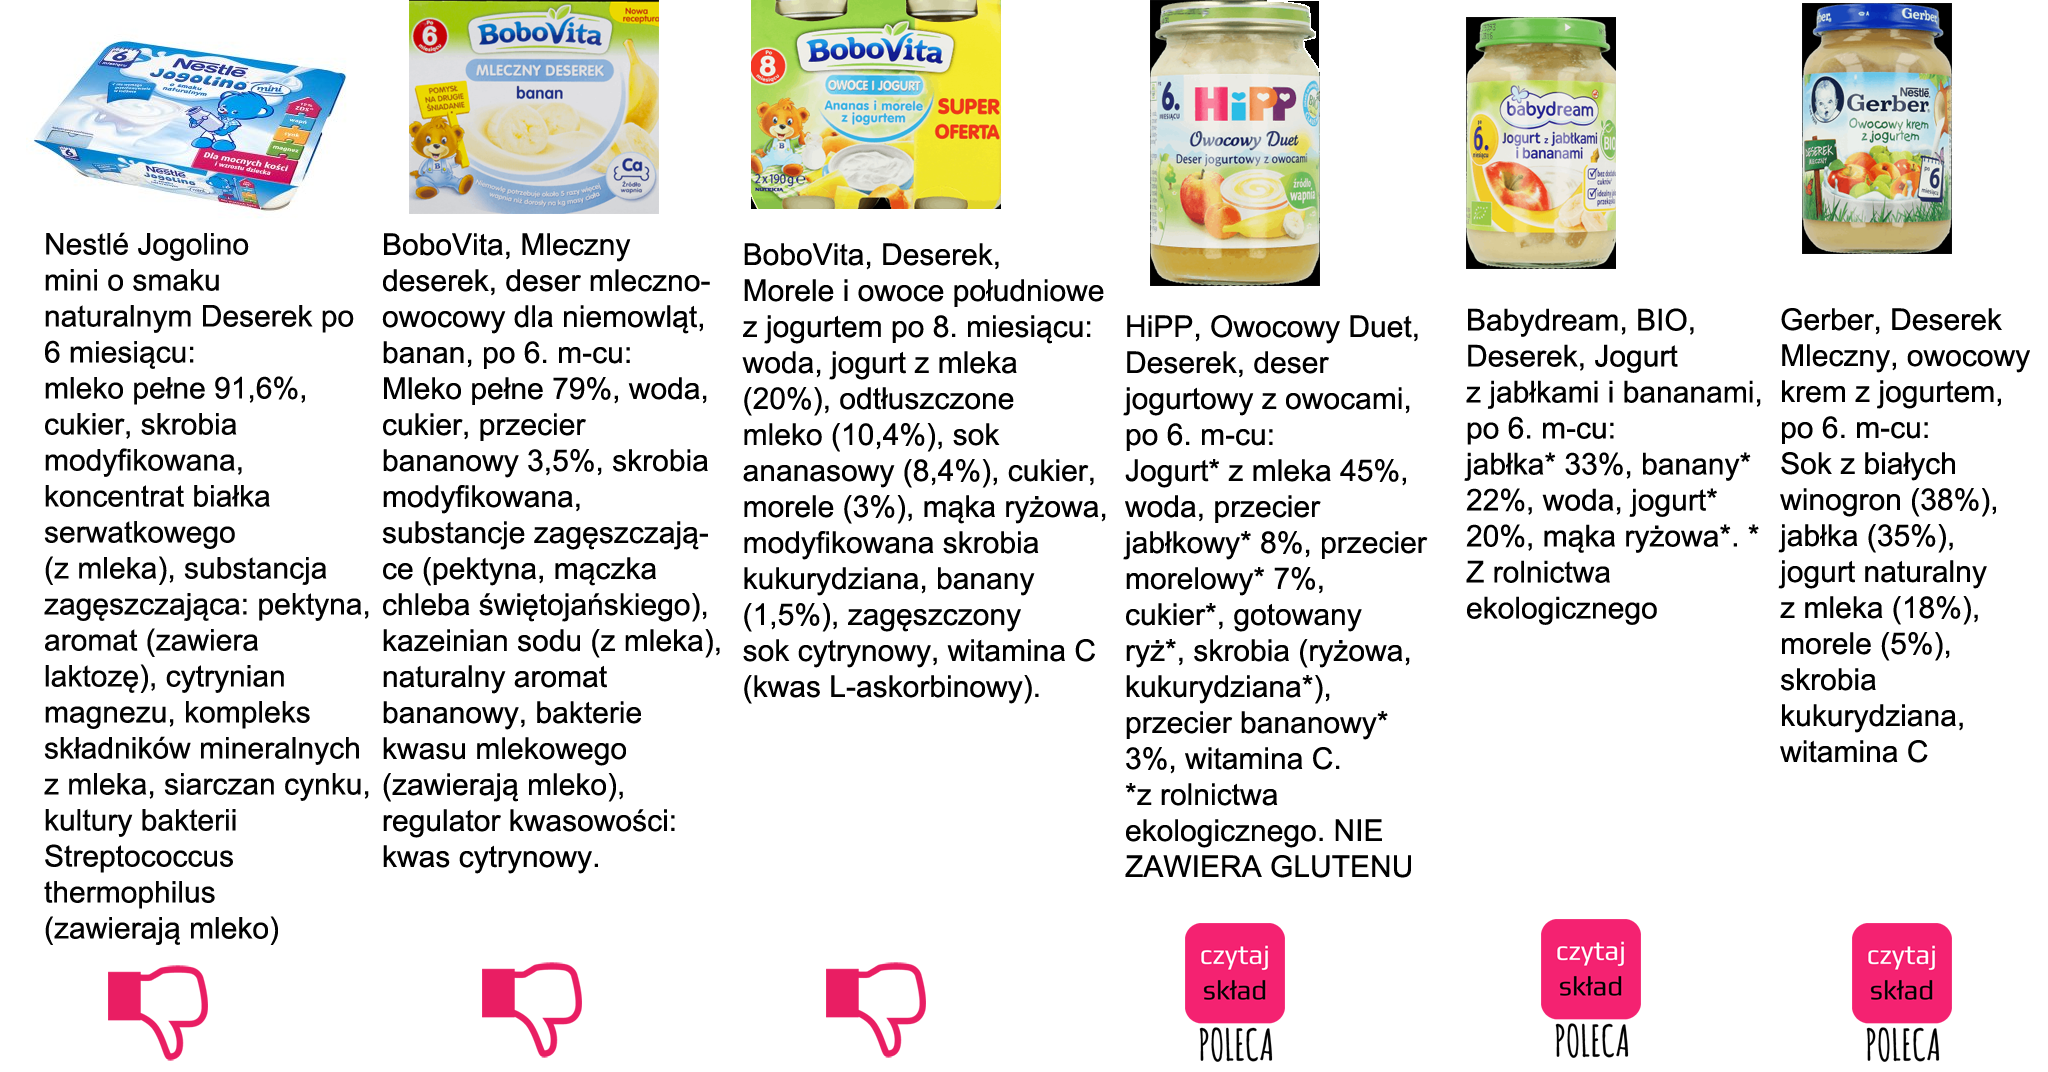 jogurciki po 6 i 8 miesiącu